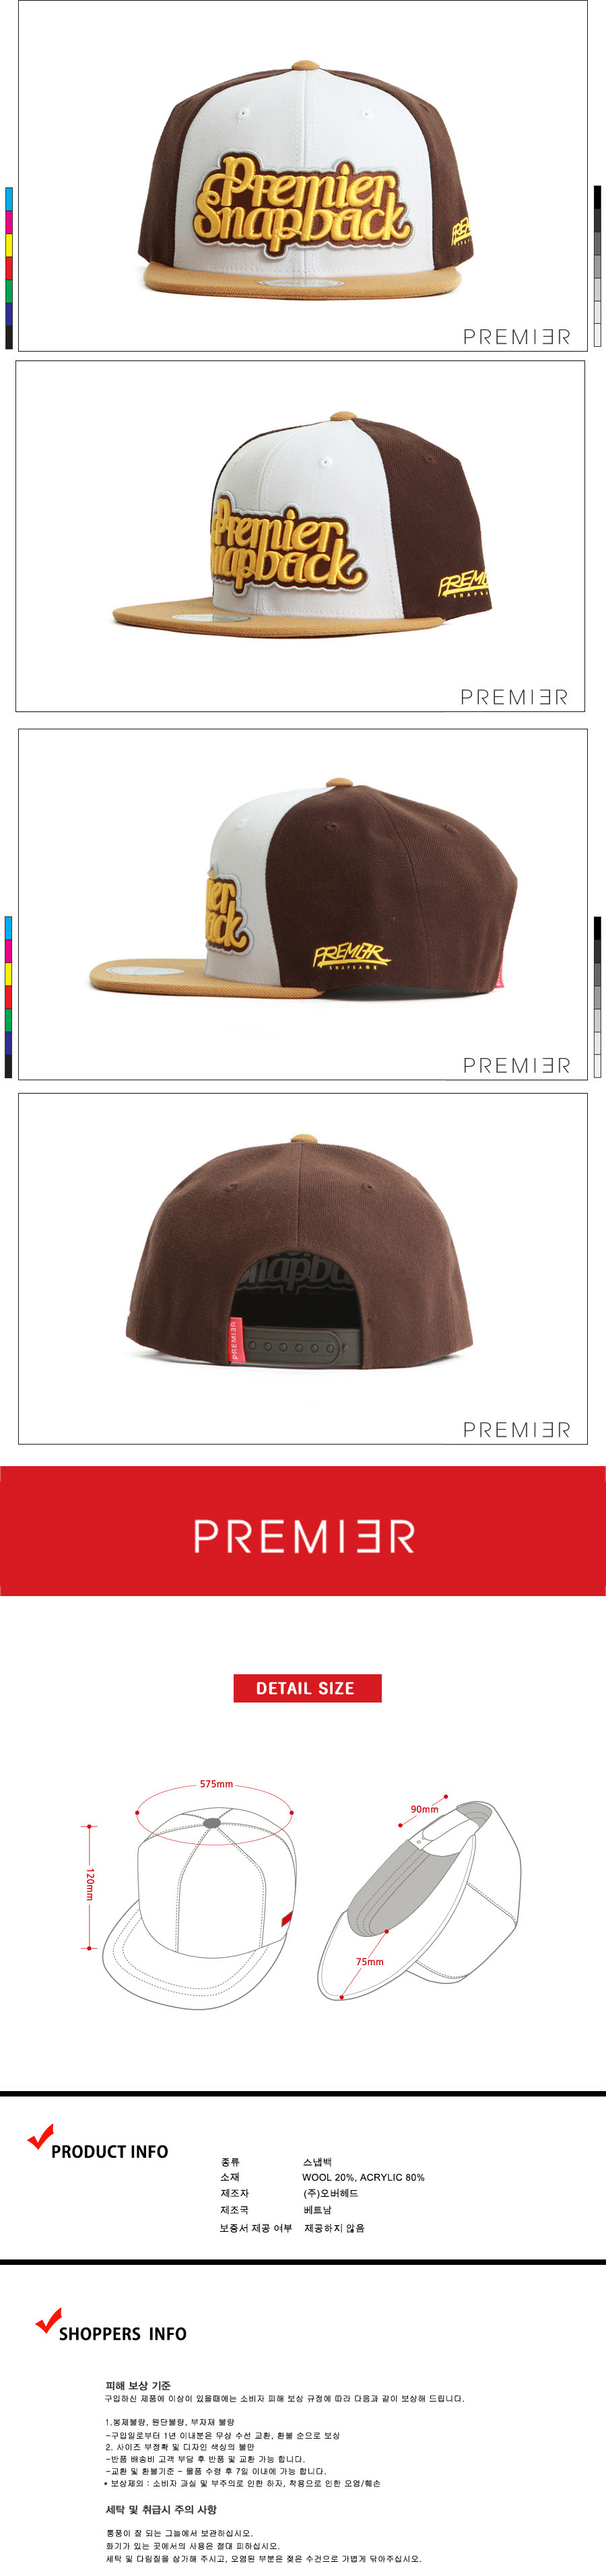 [ PREMIER ] [Premier] Snapback Clear Logo Brown/Beige (P771)